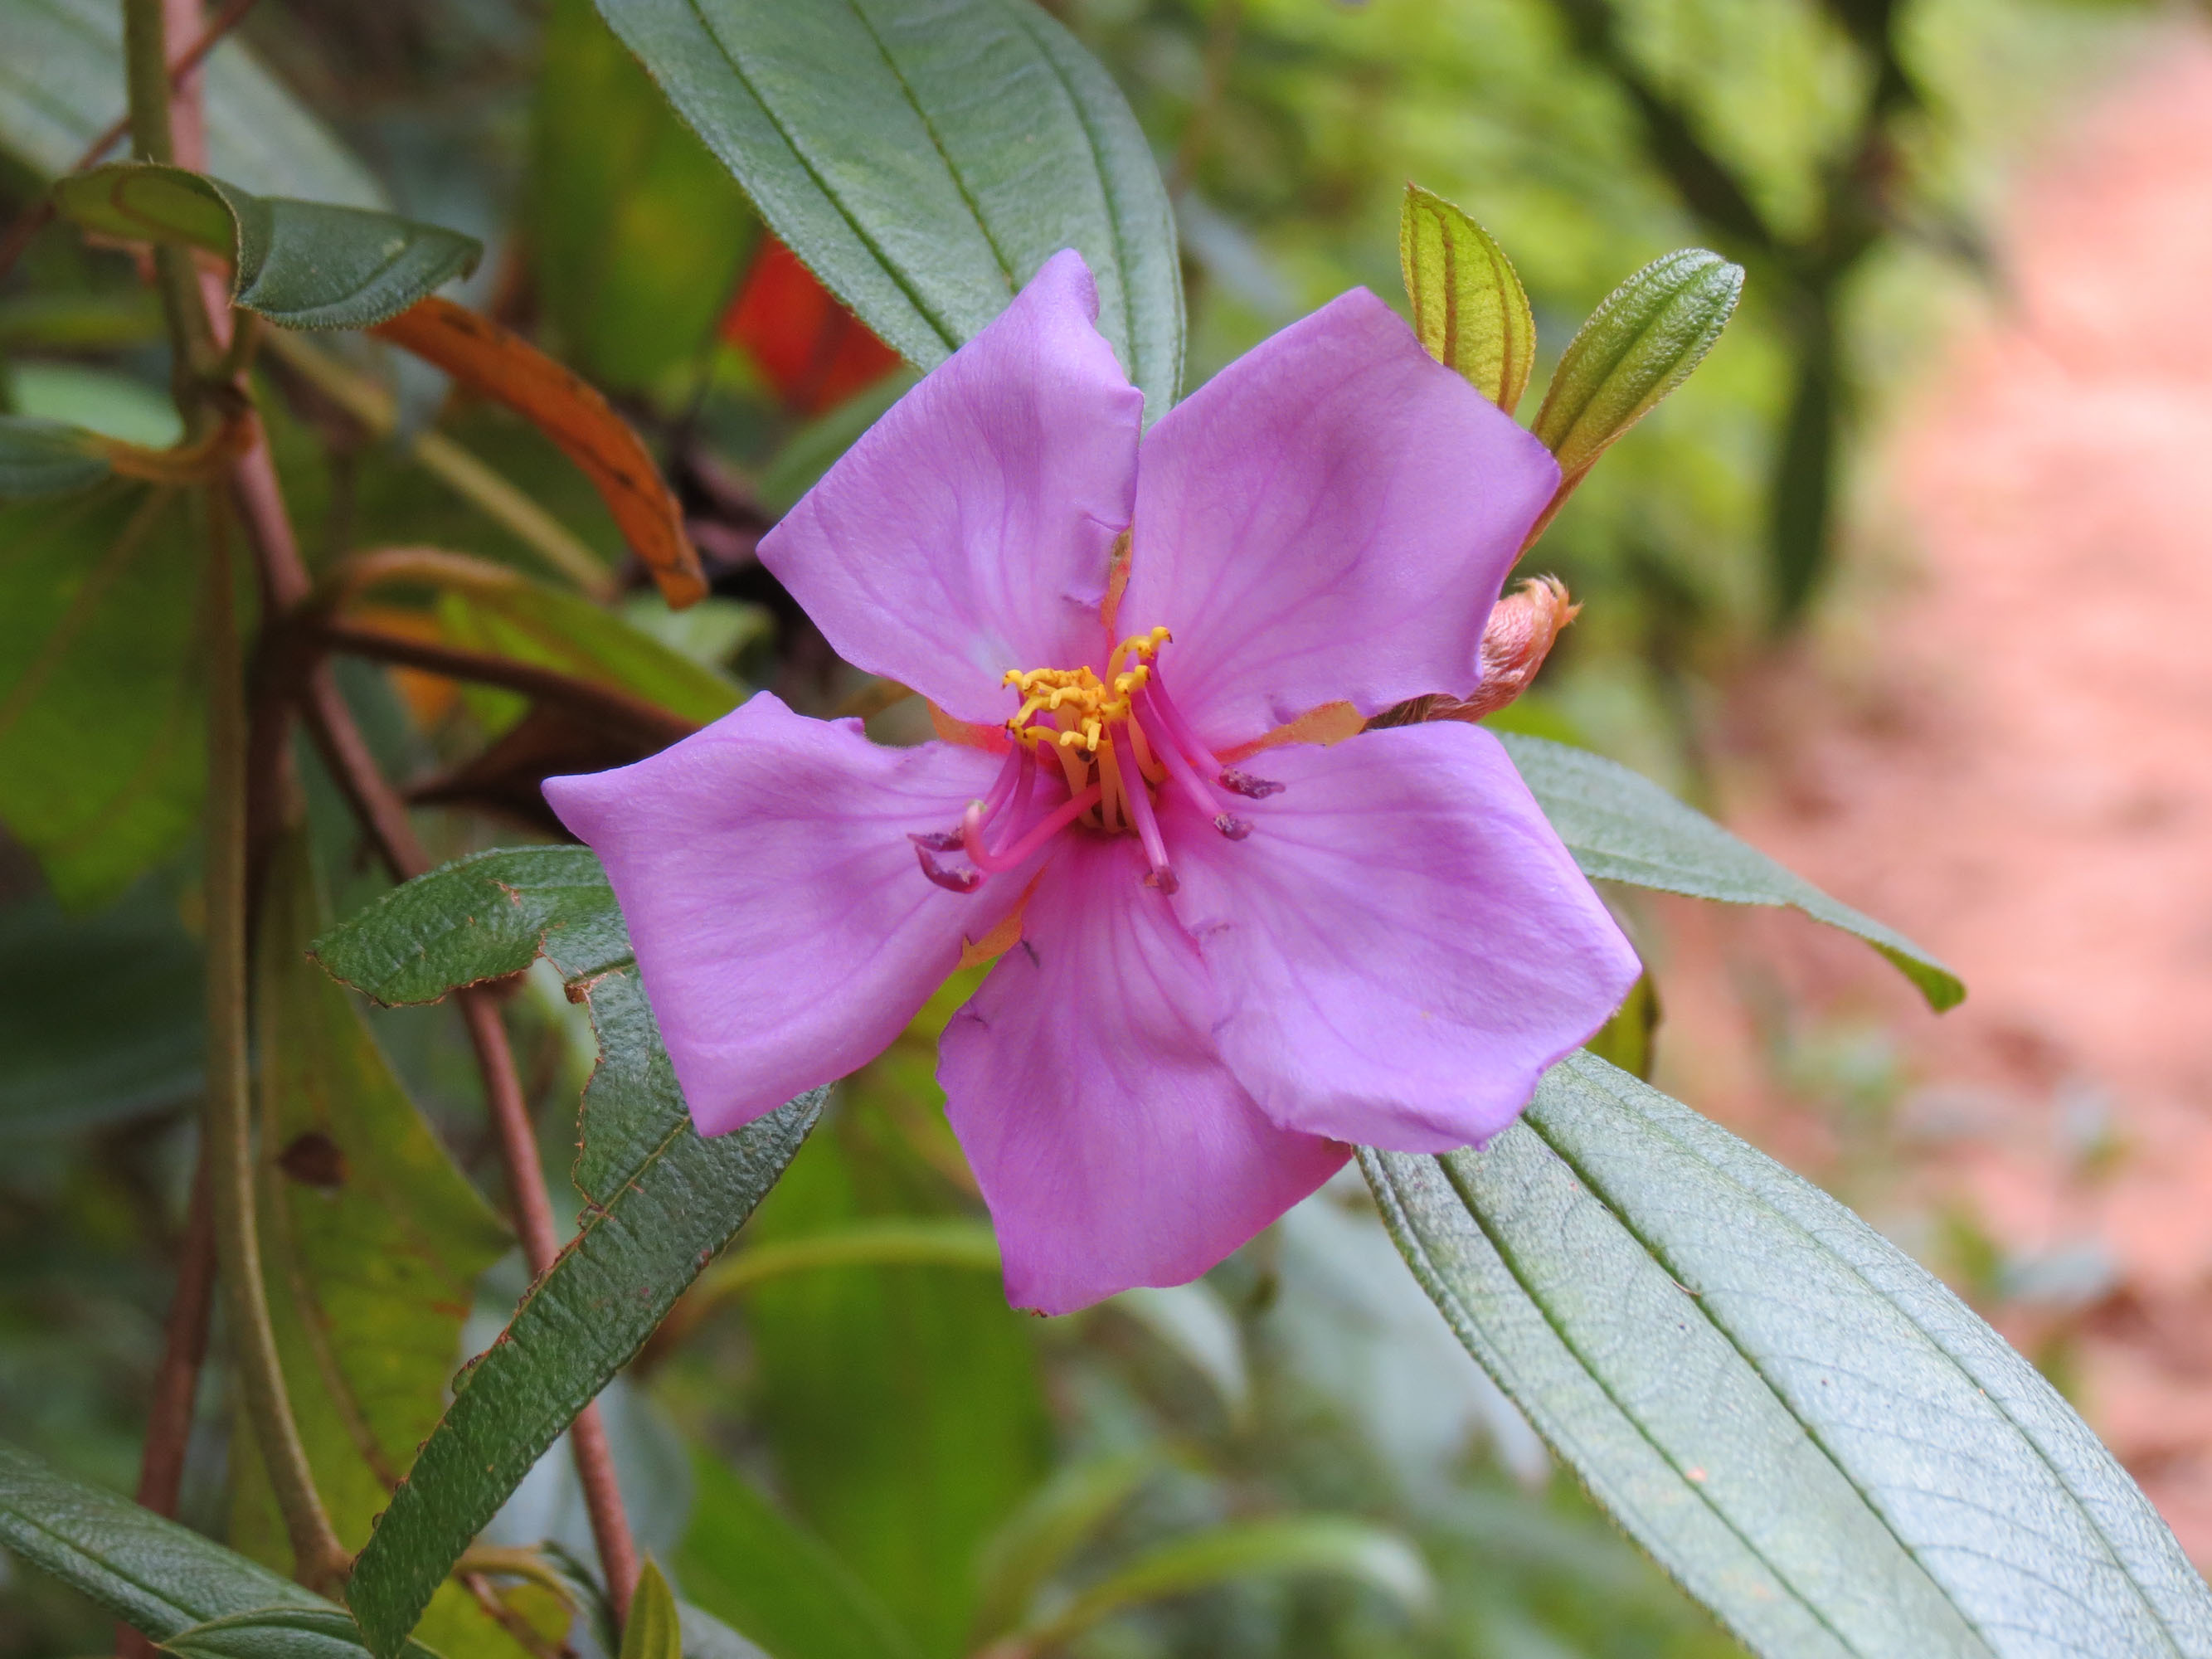 Image of Malabar melastome